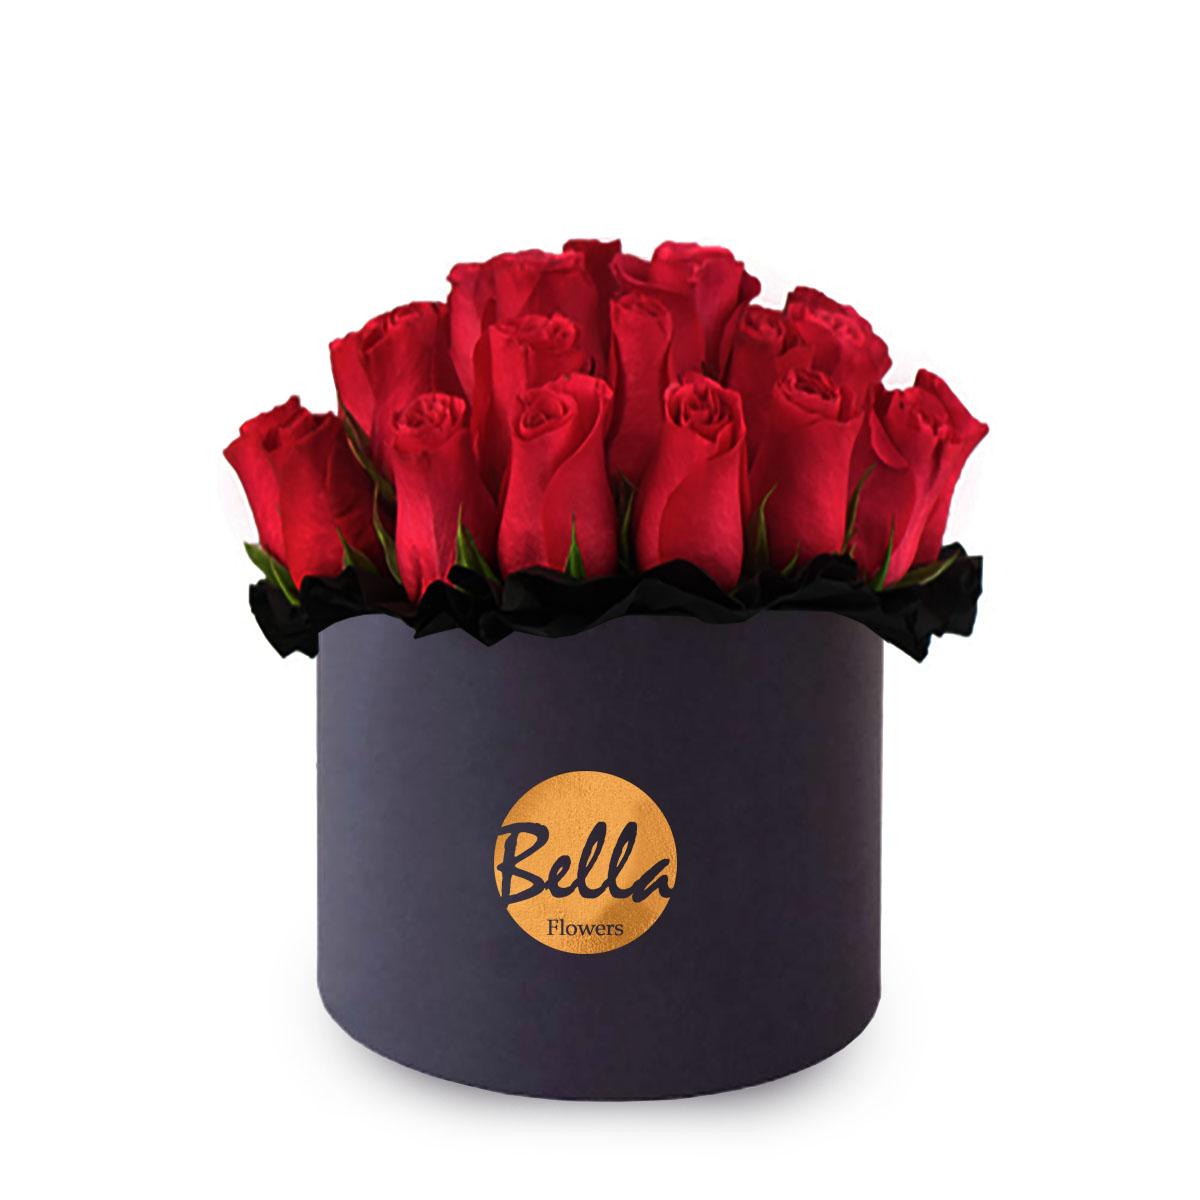 Round foil stamped flower box